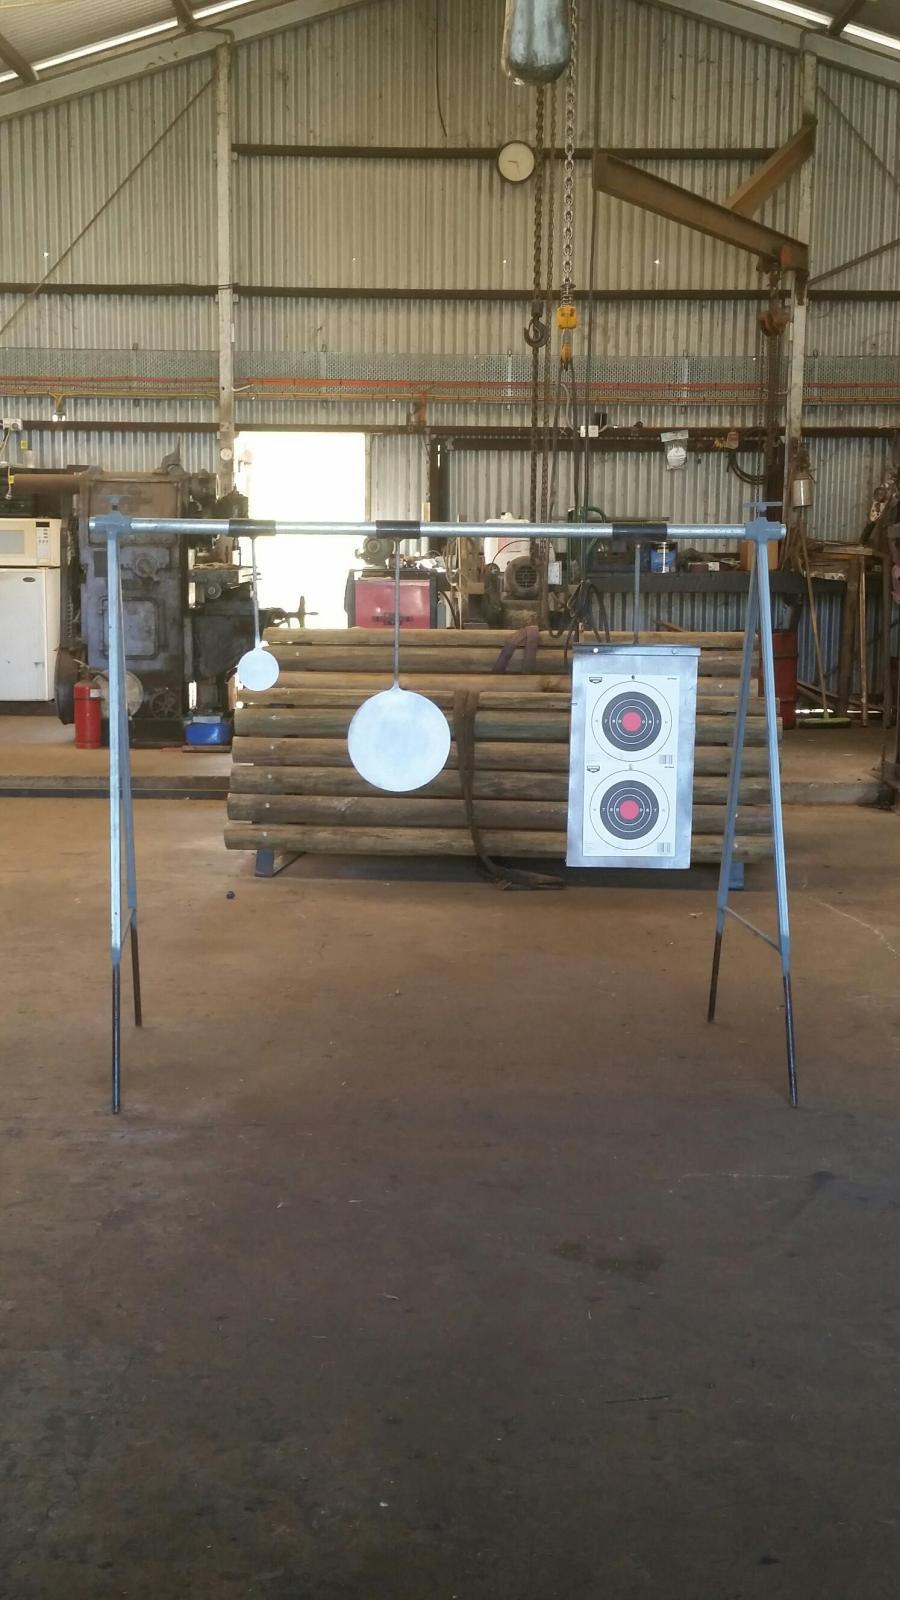 Homemade steel shooting targets